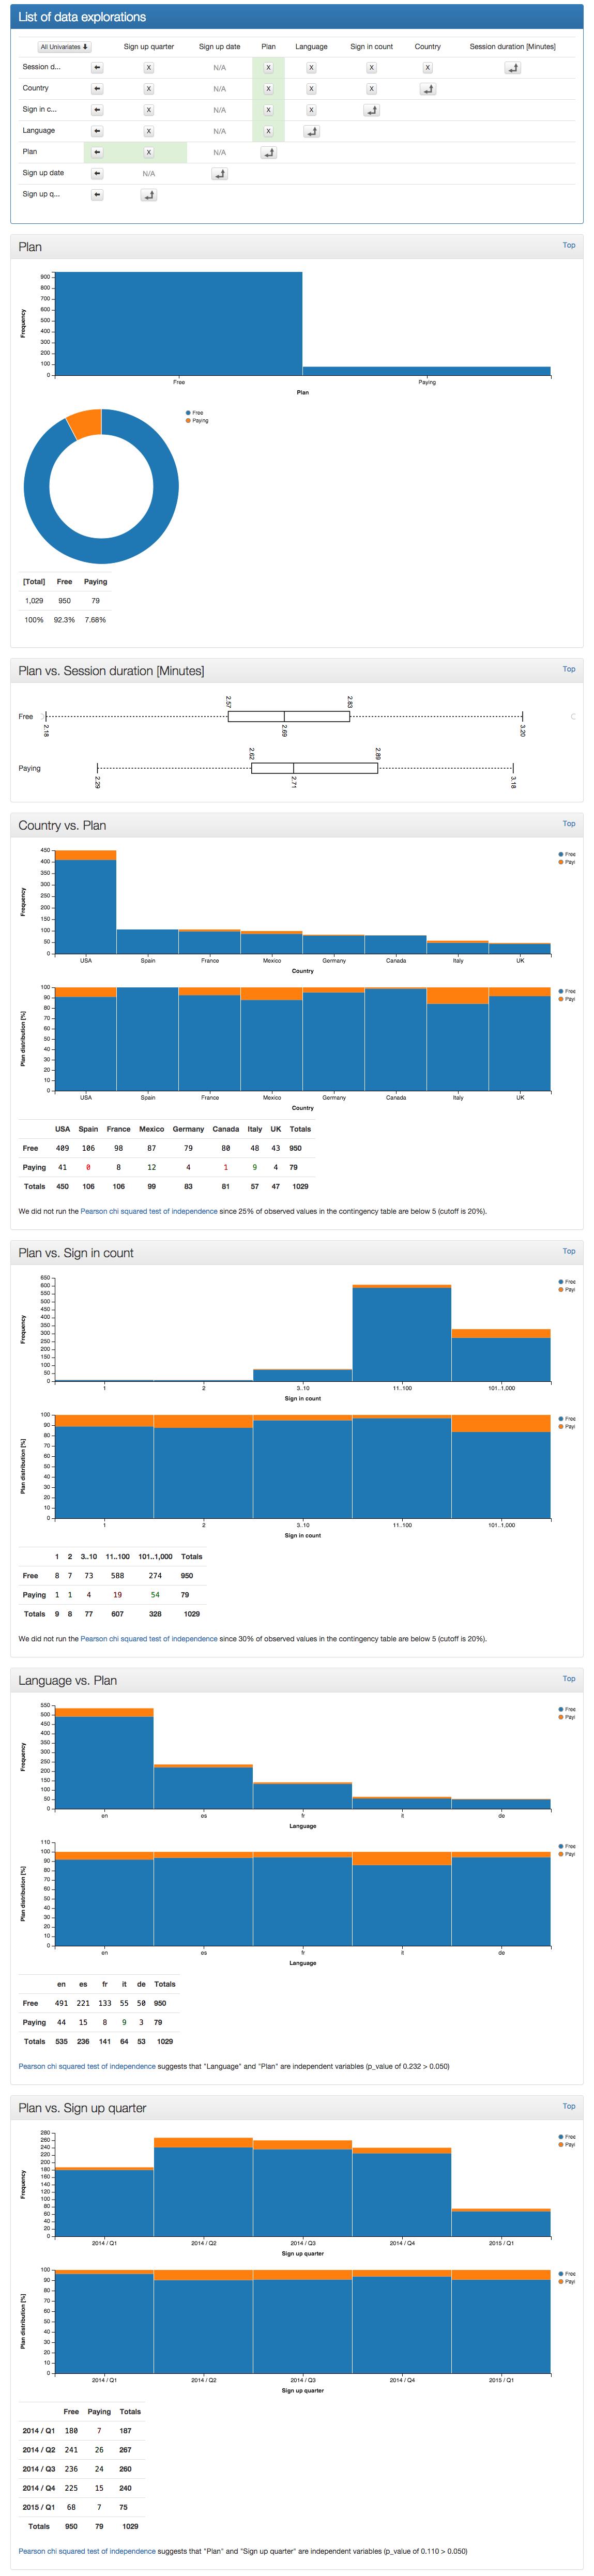 Rails Data Explorer Screenshot